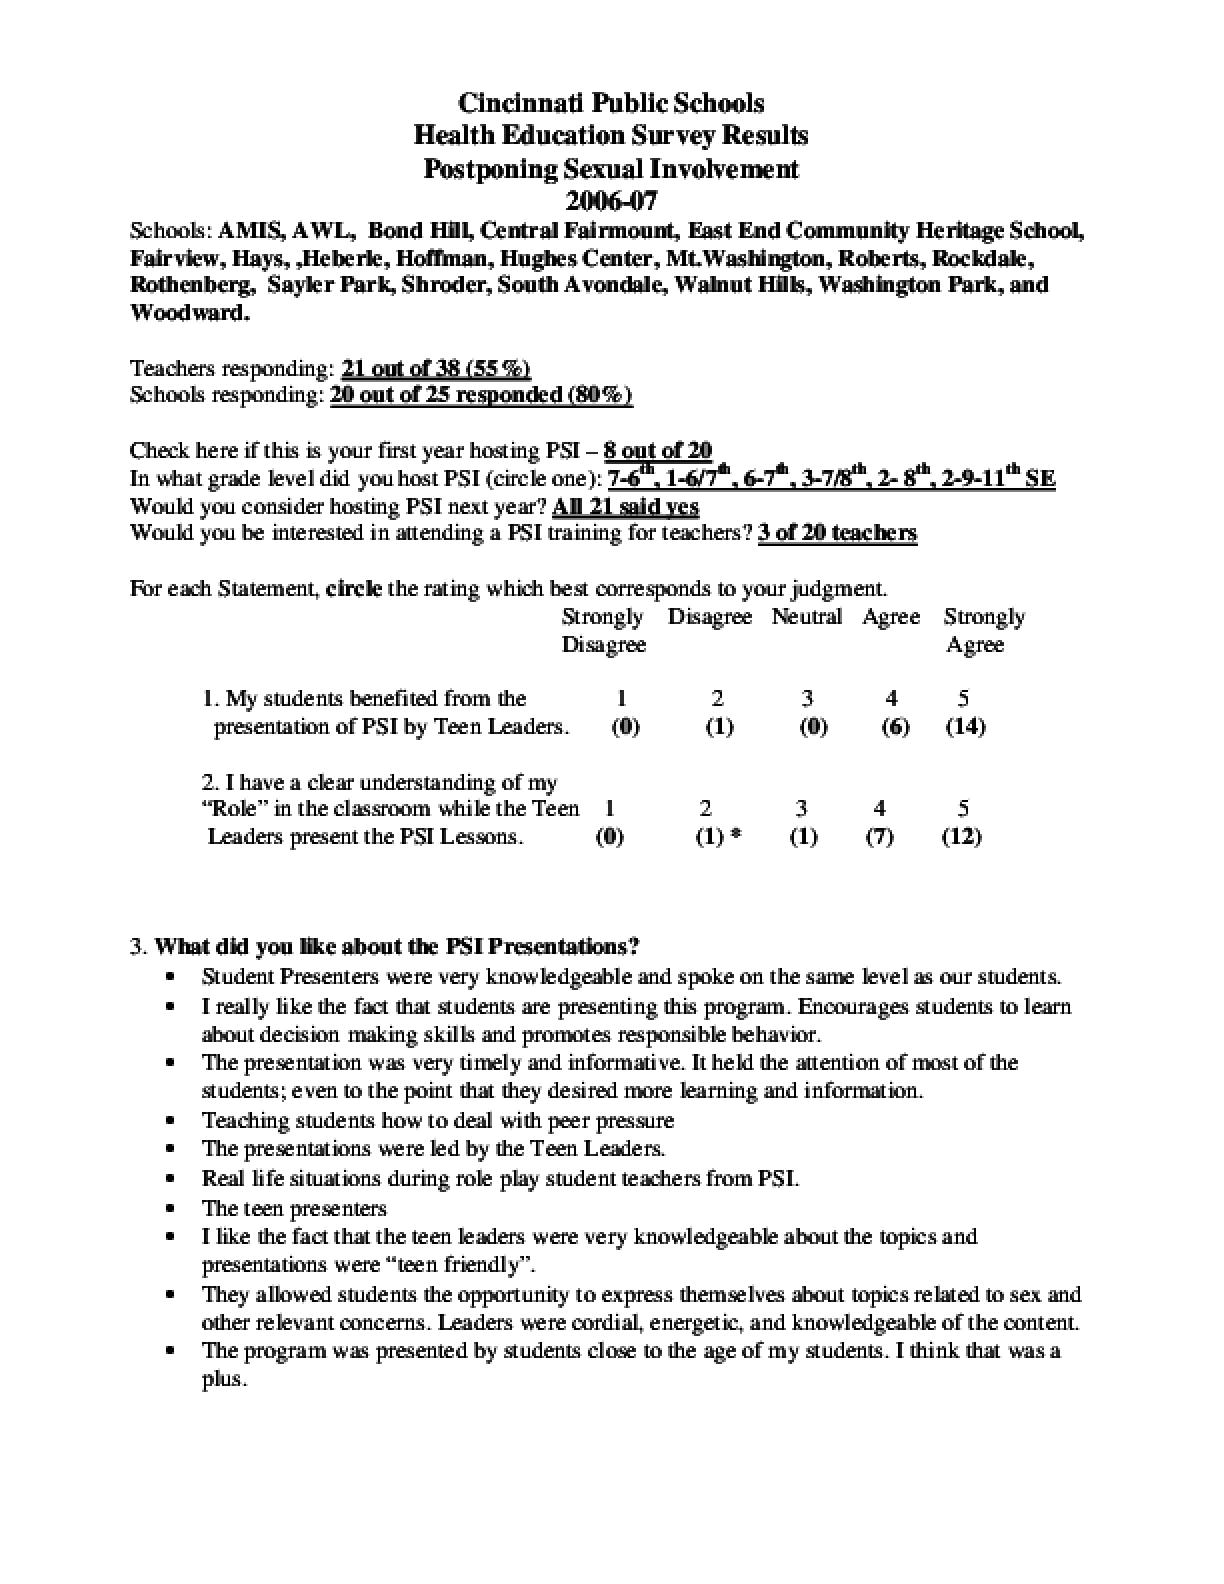 Postponing Sexual Involvement Teacher Survey Results 2006-07